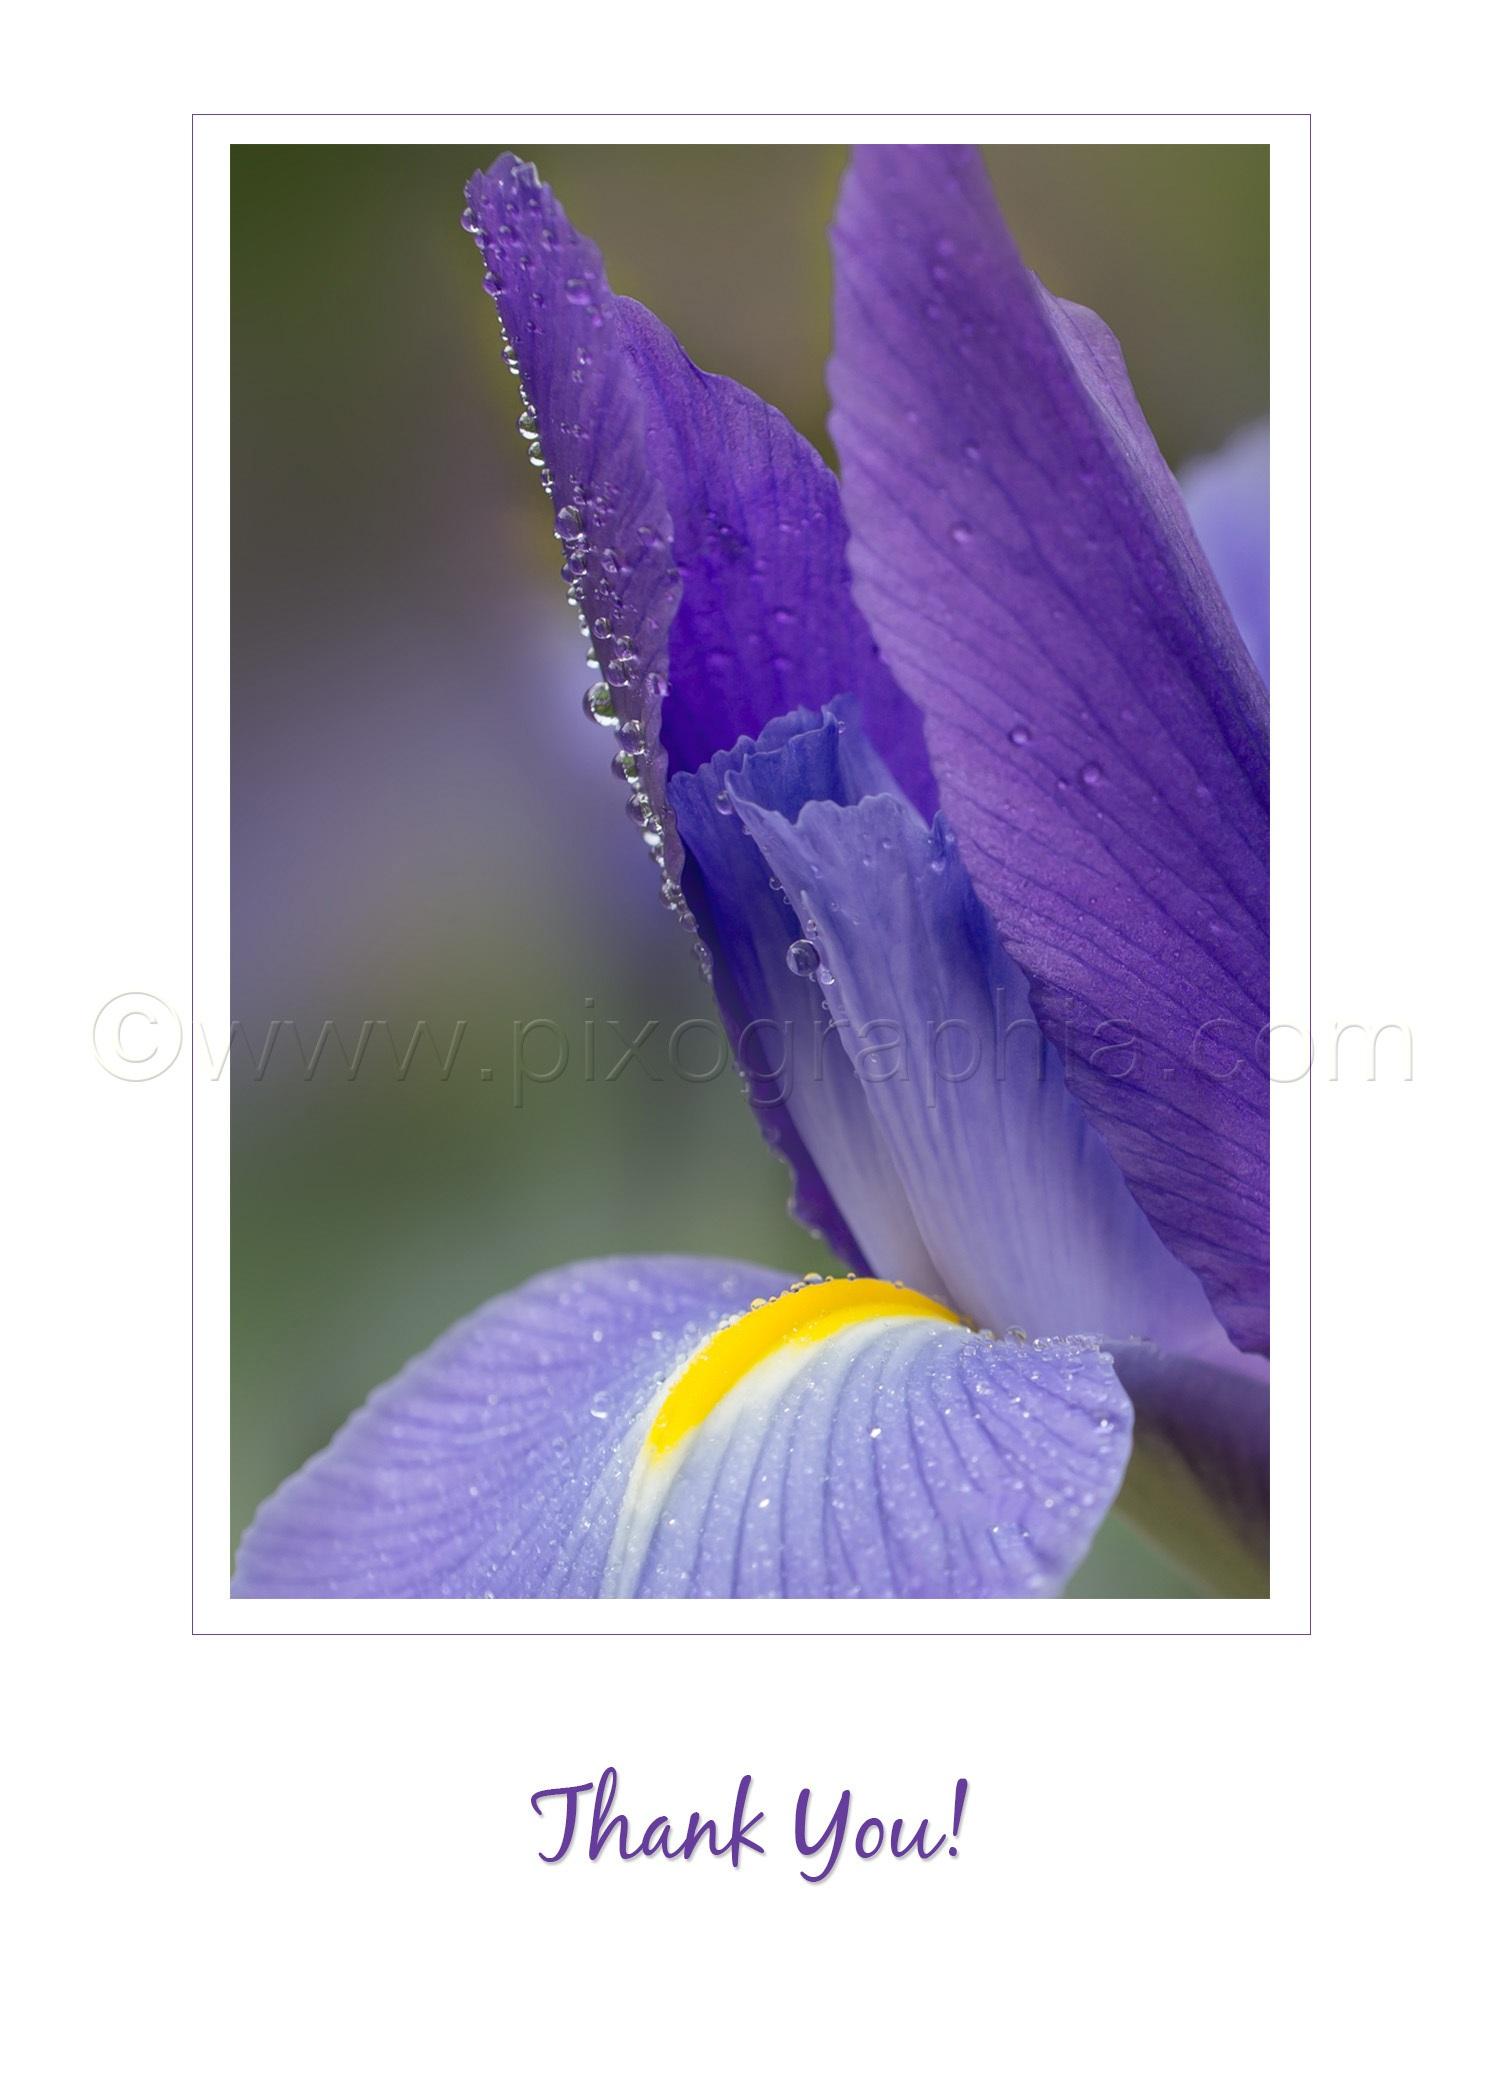 Iris_ThankYou_vertical.jpg